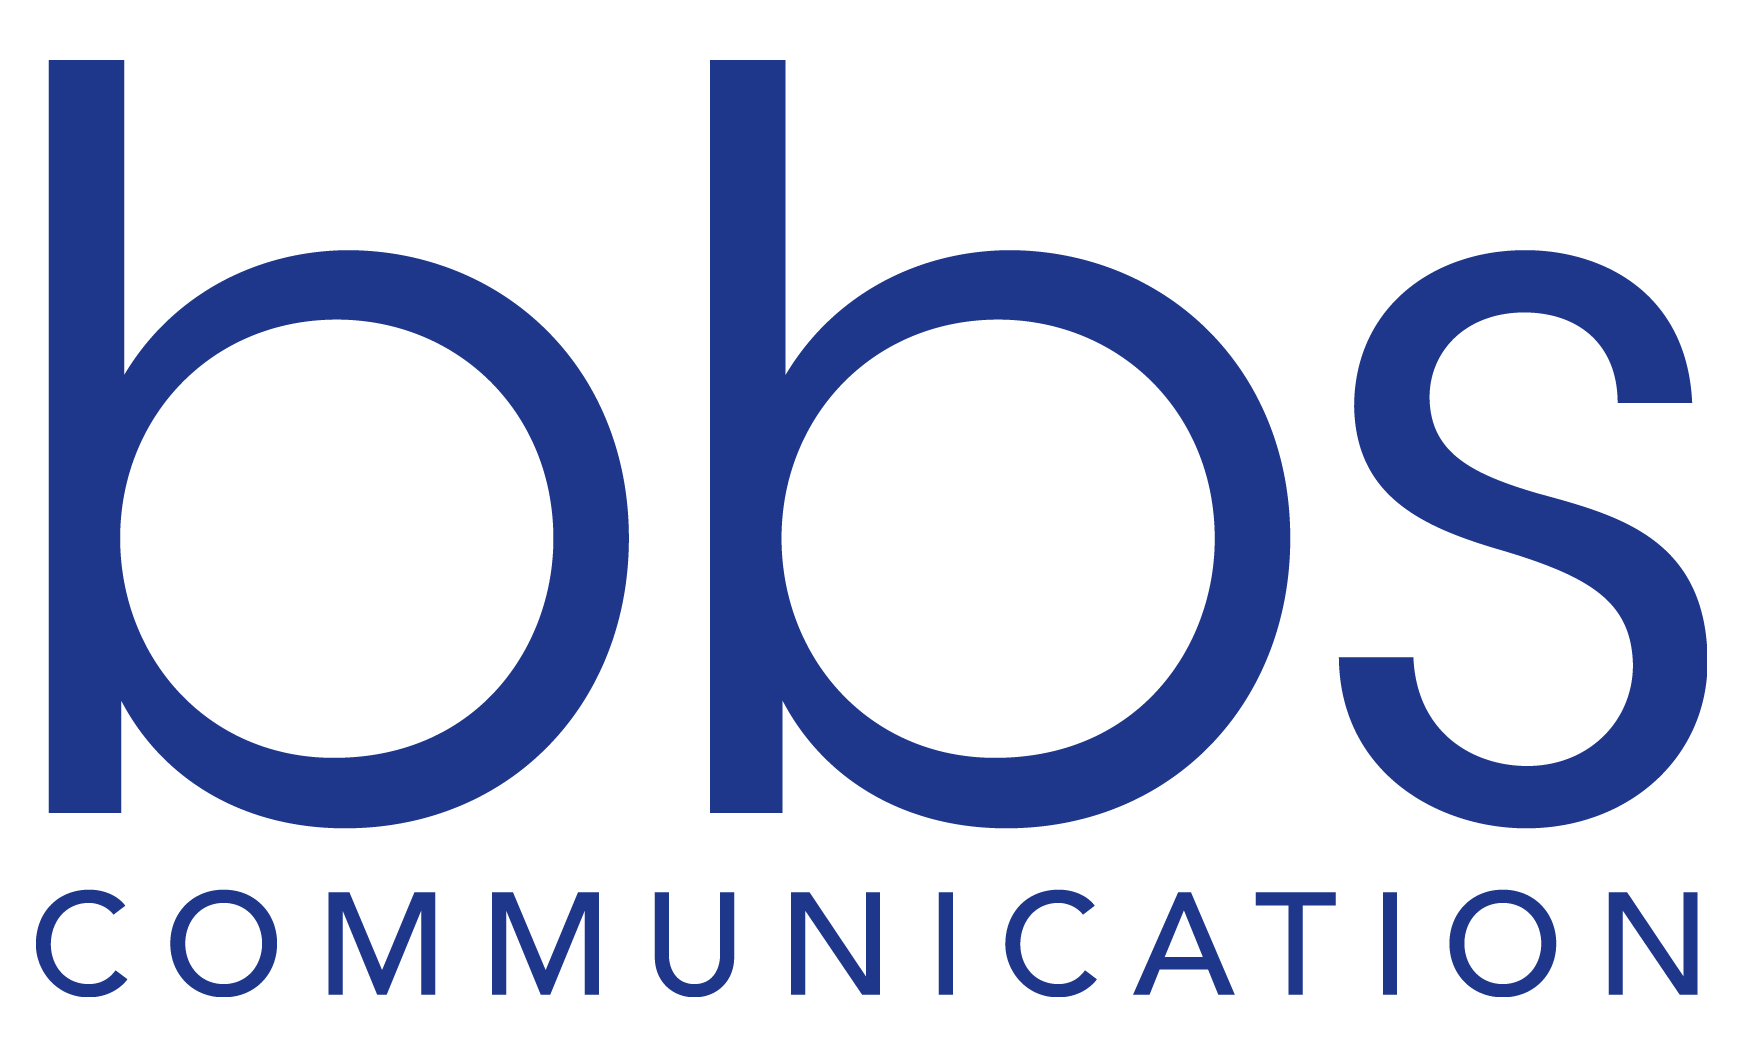 BBS Communication